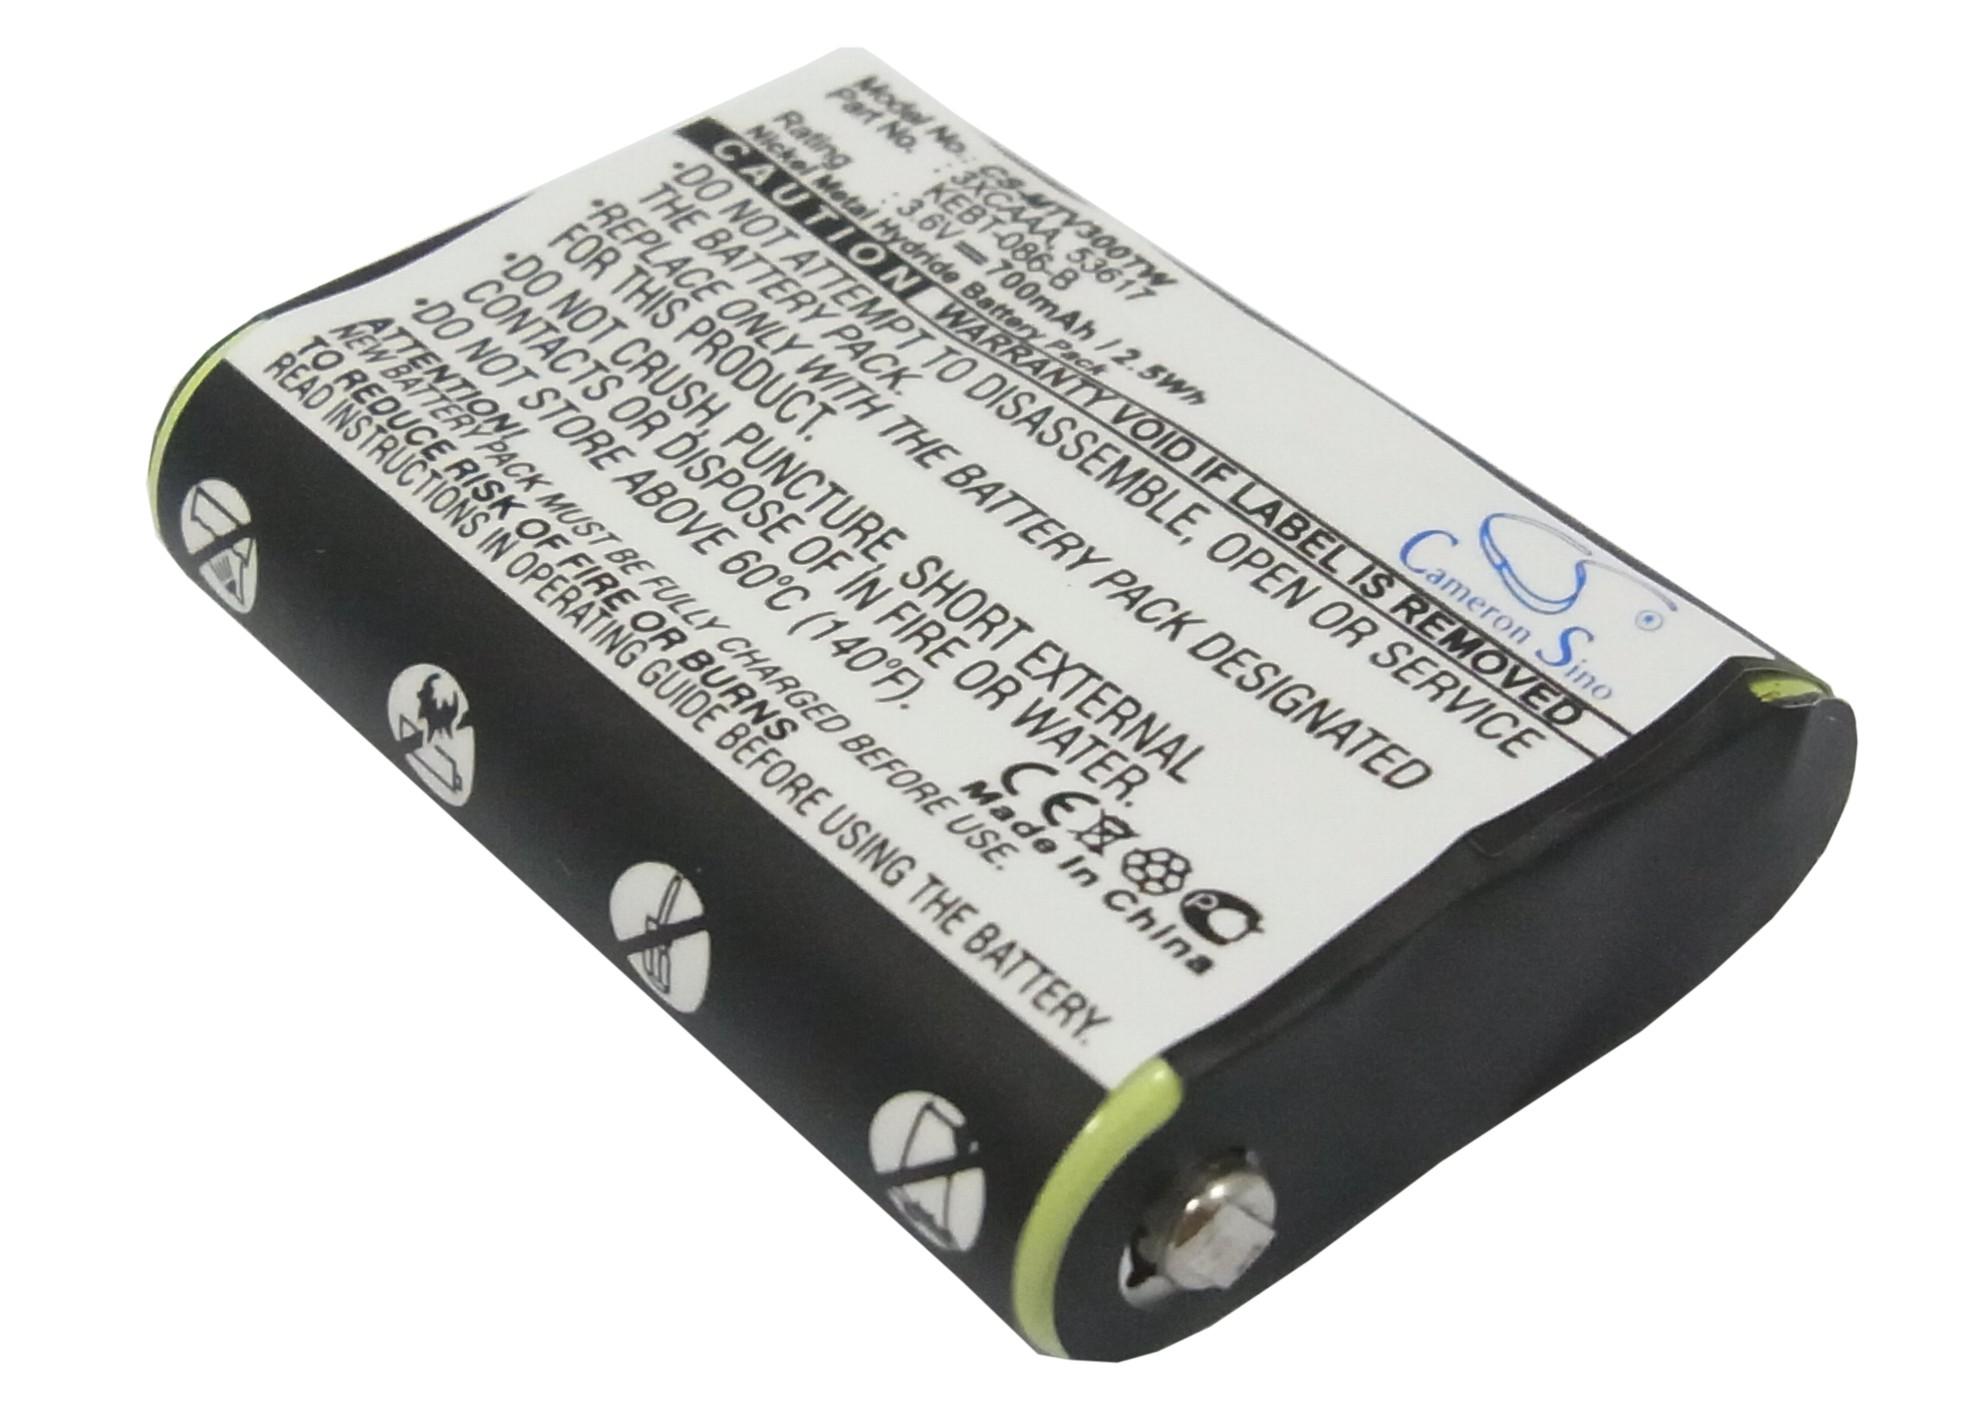 Cameron Sino baterie do vysílaček pro MOTOROLA SX800R 3.6V Ni-MH 700mAh černá - neoriginální